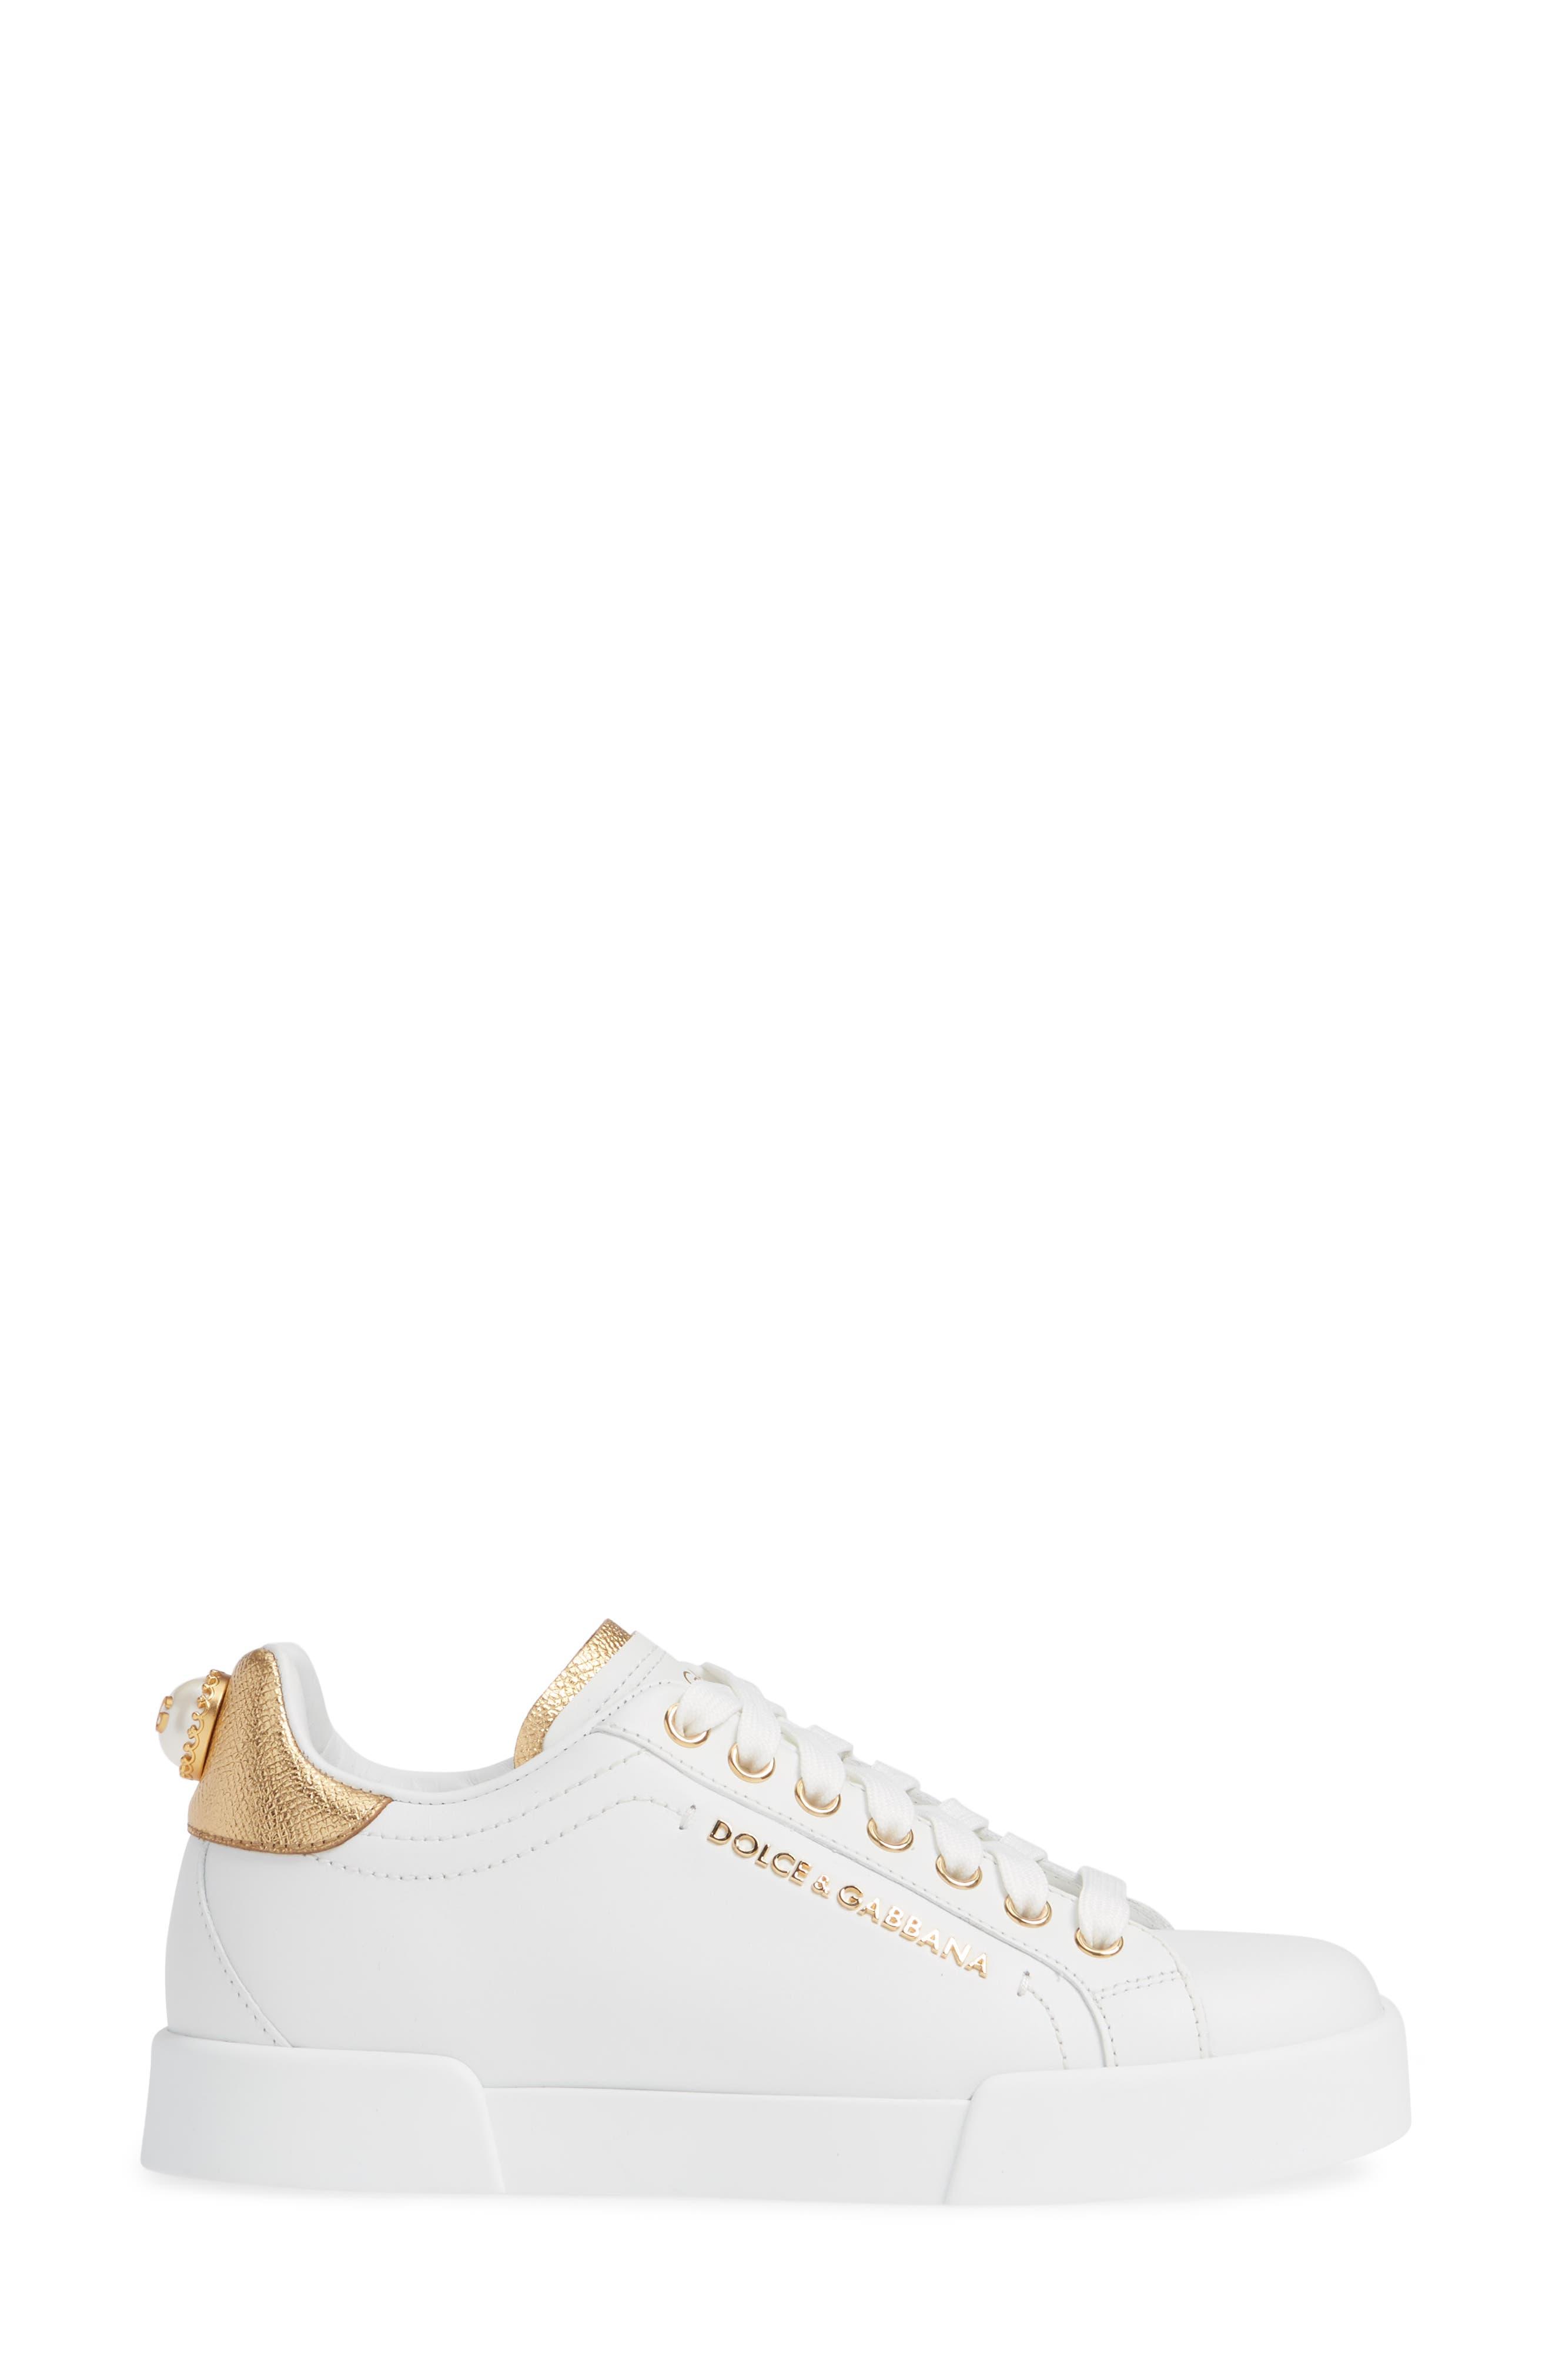 DOLCE&GABBANA, Portofino Embellished Sneaker, Alternate thumbnail 3, color, WHITE/ GOLD